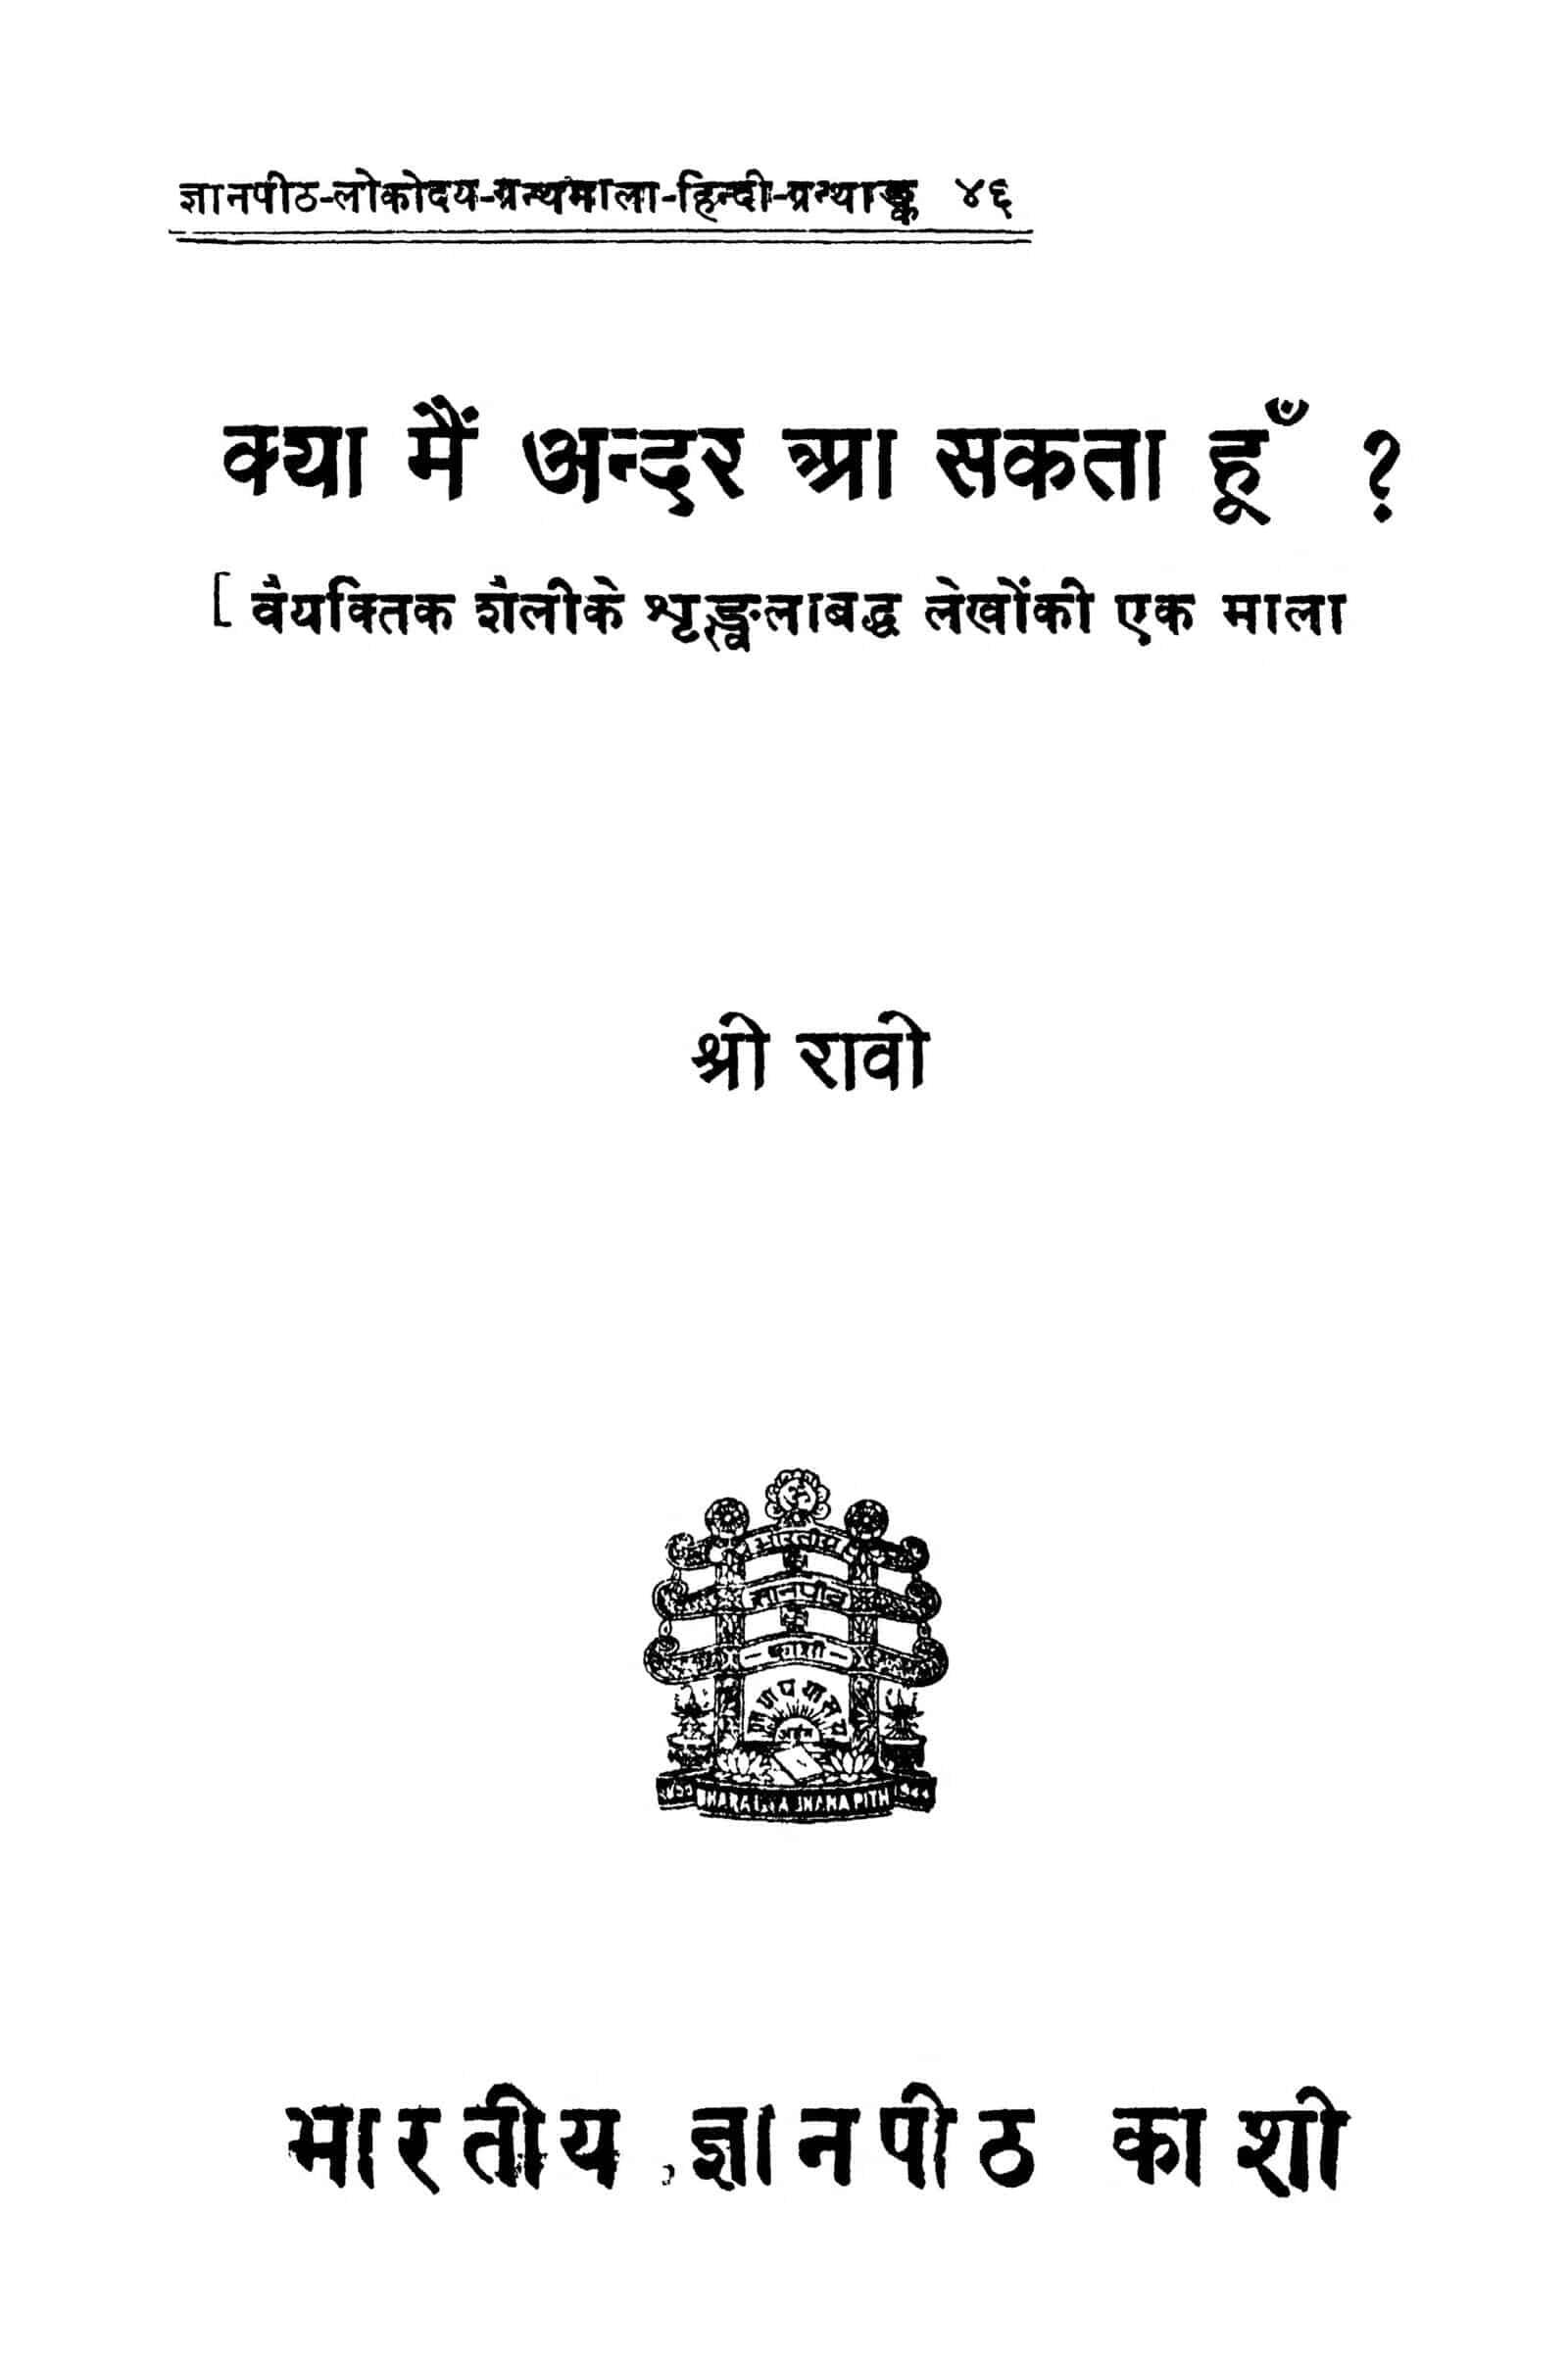 Book Image : क्या मैं अन्दर आ सकता हूँ  - Kya Main Andar Aa Sakta Hun